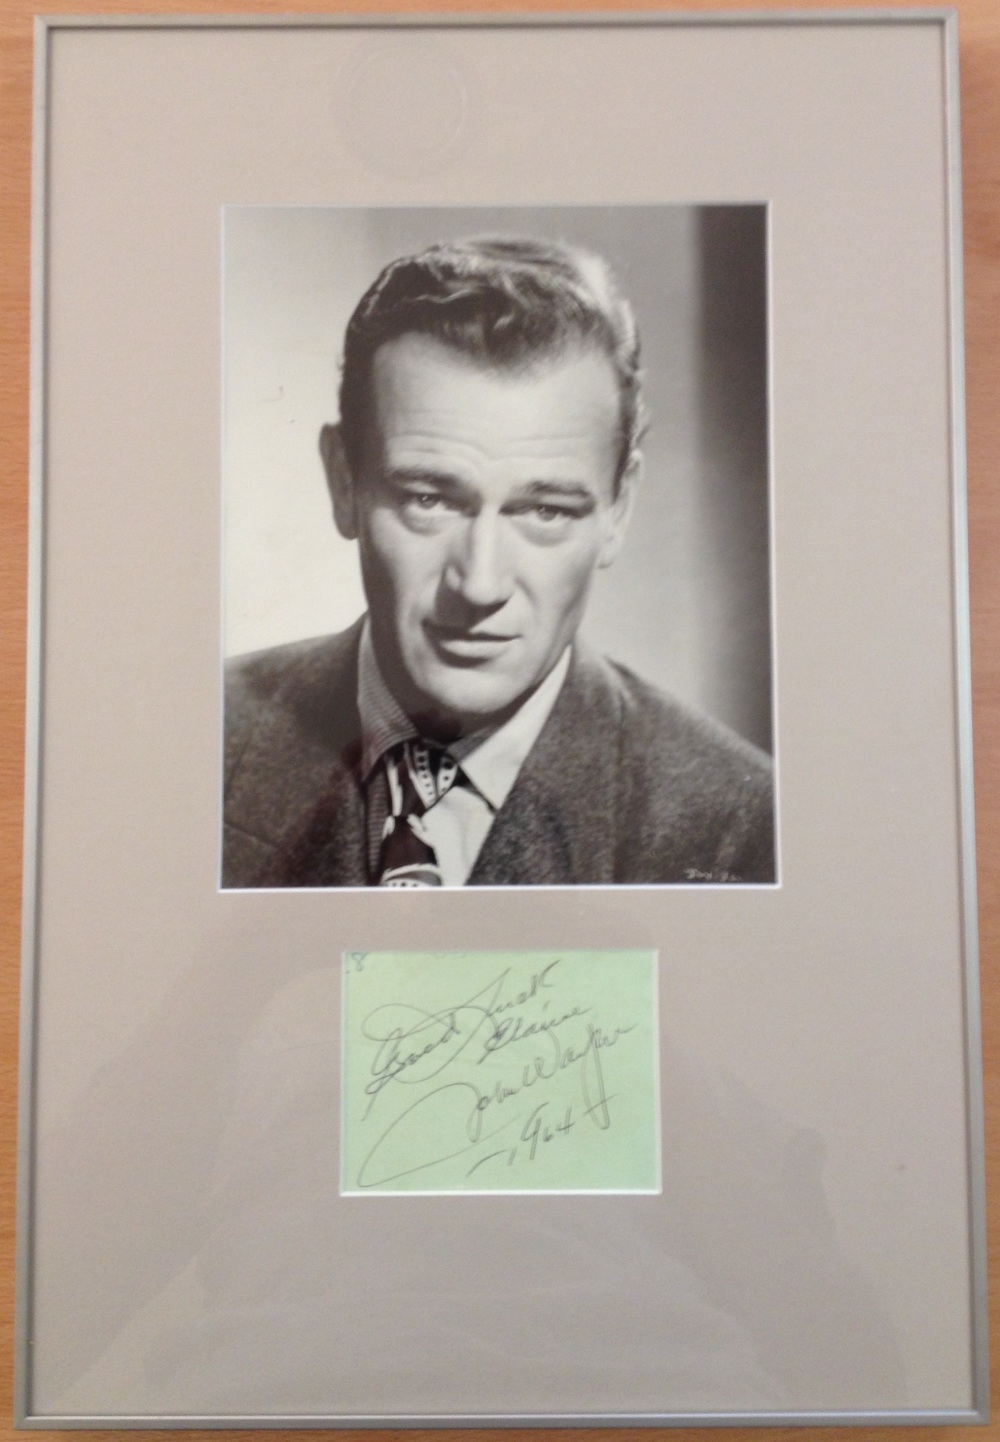 WAYNE JOHN: (1907-1979) American Actor, Academy Award winner. Black ink signature and inscription on